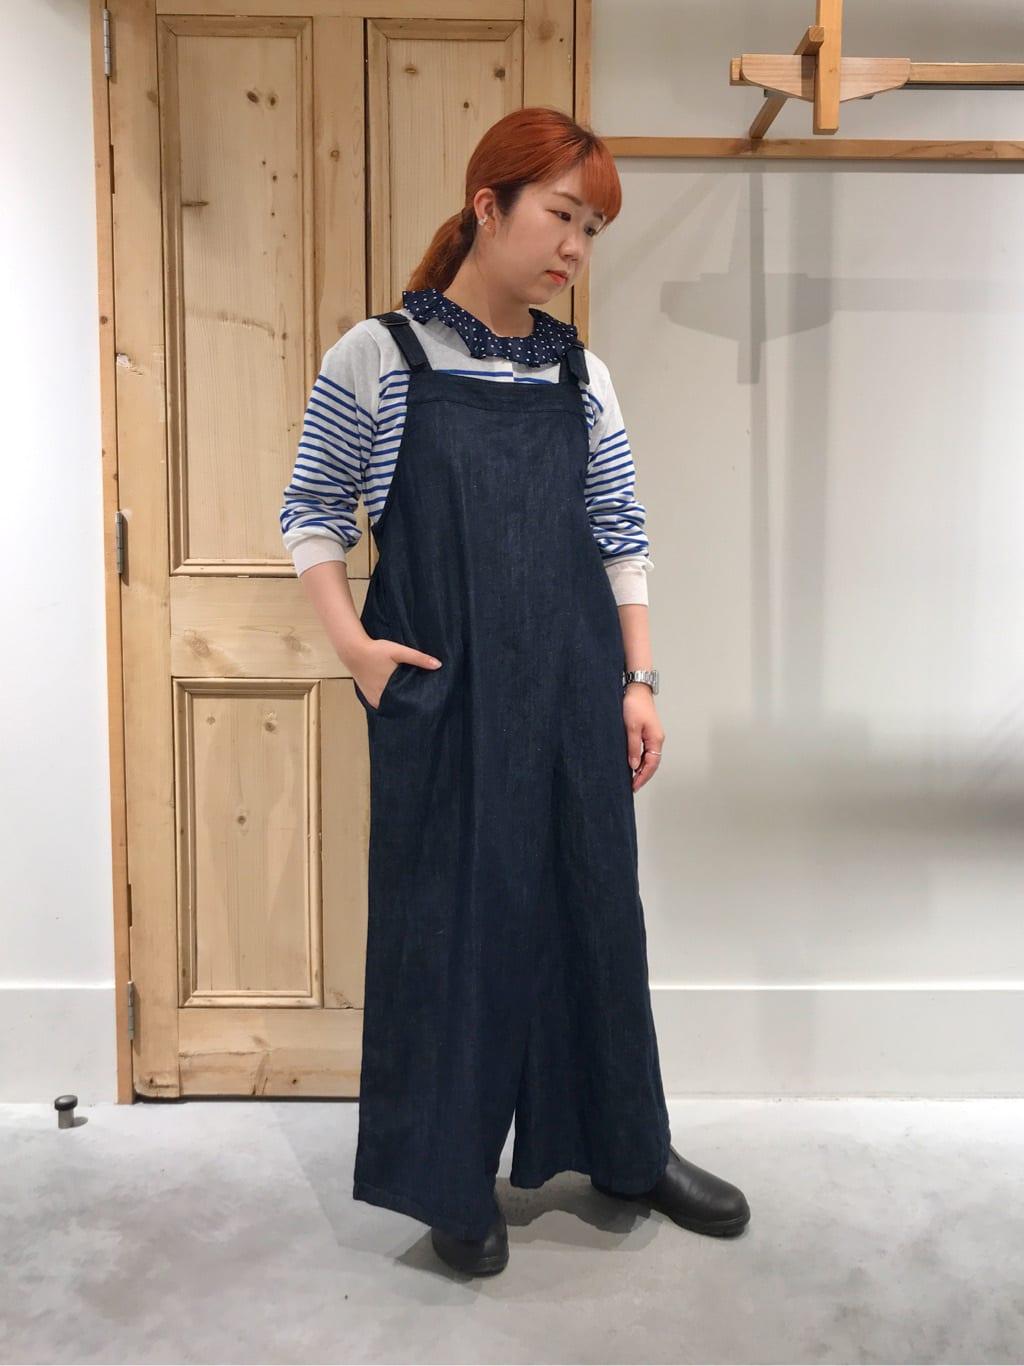 Malle chambre de charme 調布パルコ 身長:155cm 2021.06.18